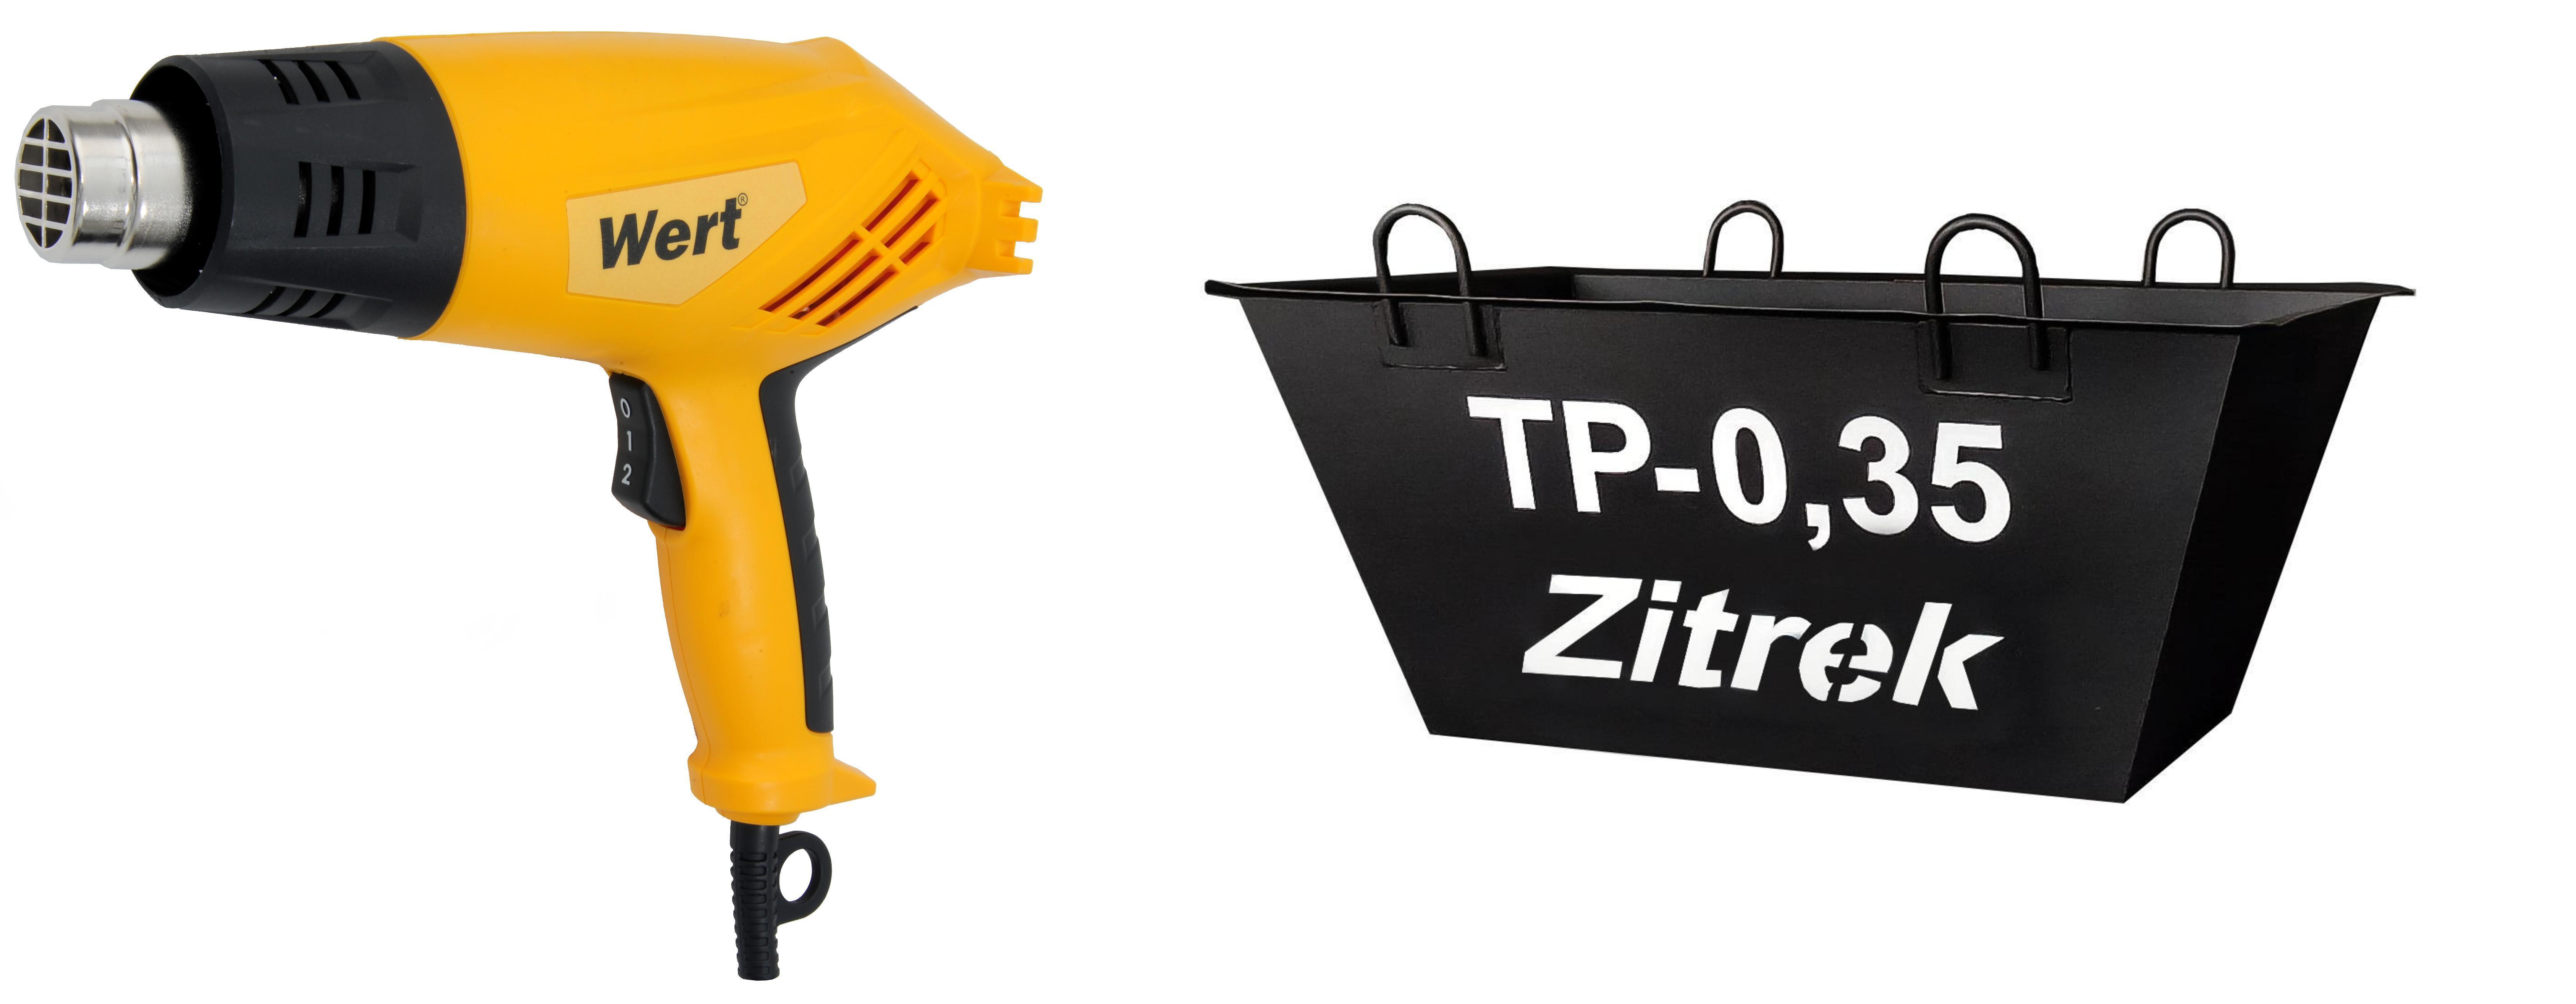 Набор Zitrek Тара для раствора ТР-0,35 (021-2058) +Фен технический ehg 1800